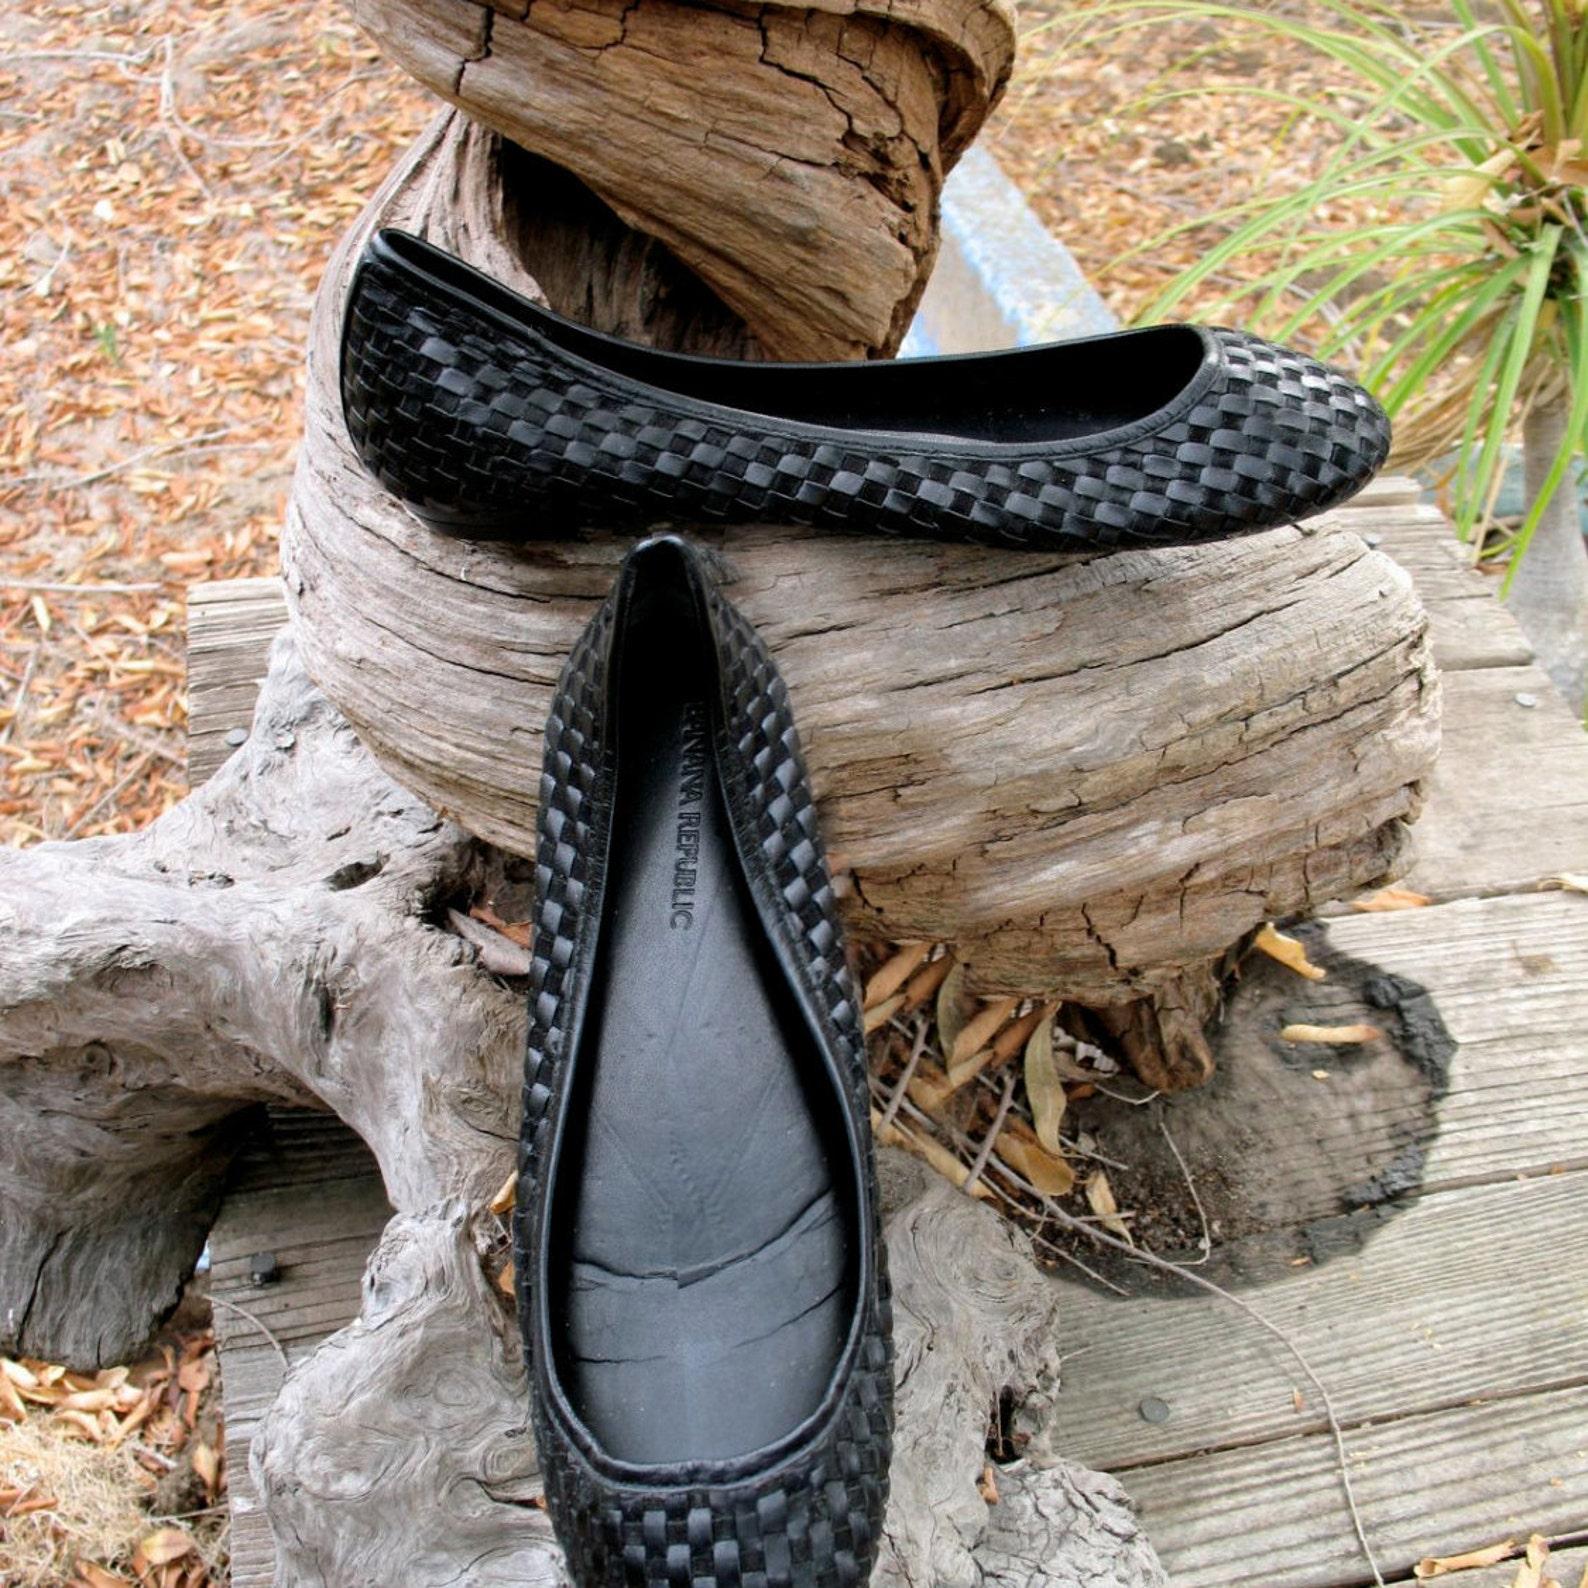 banana republic black woven leather ballet shoes audrey hepburn style size 7 1 /2 m